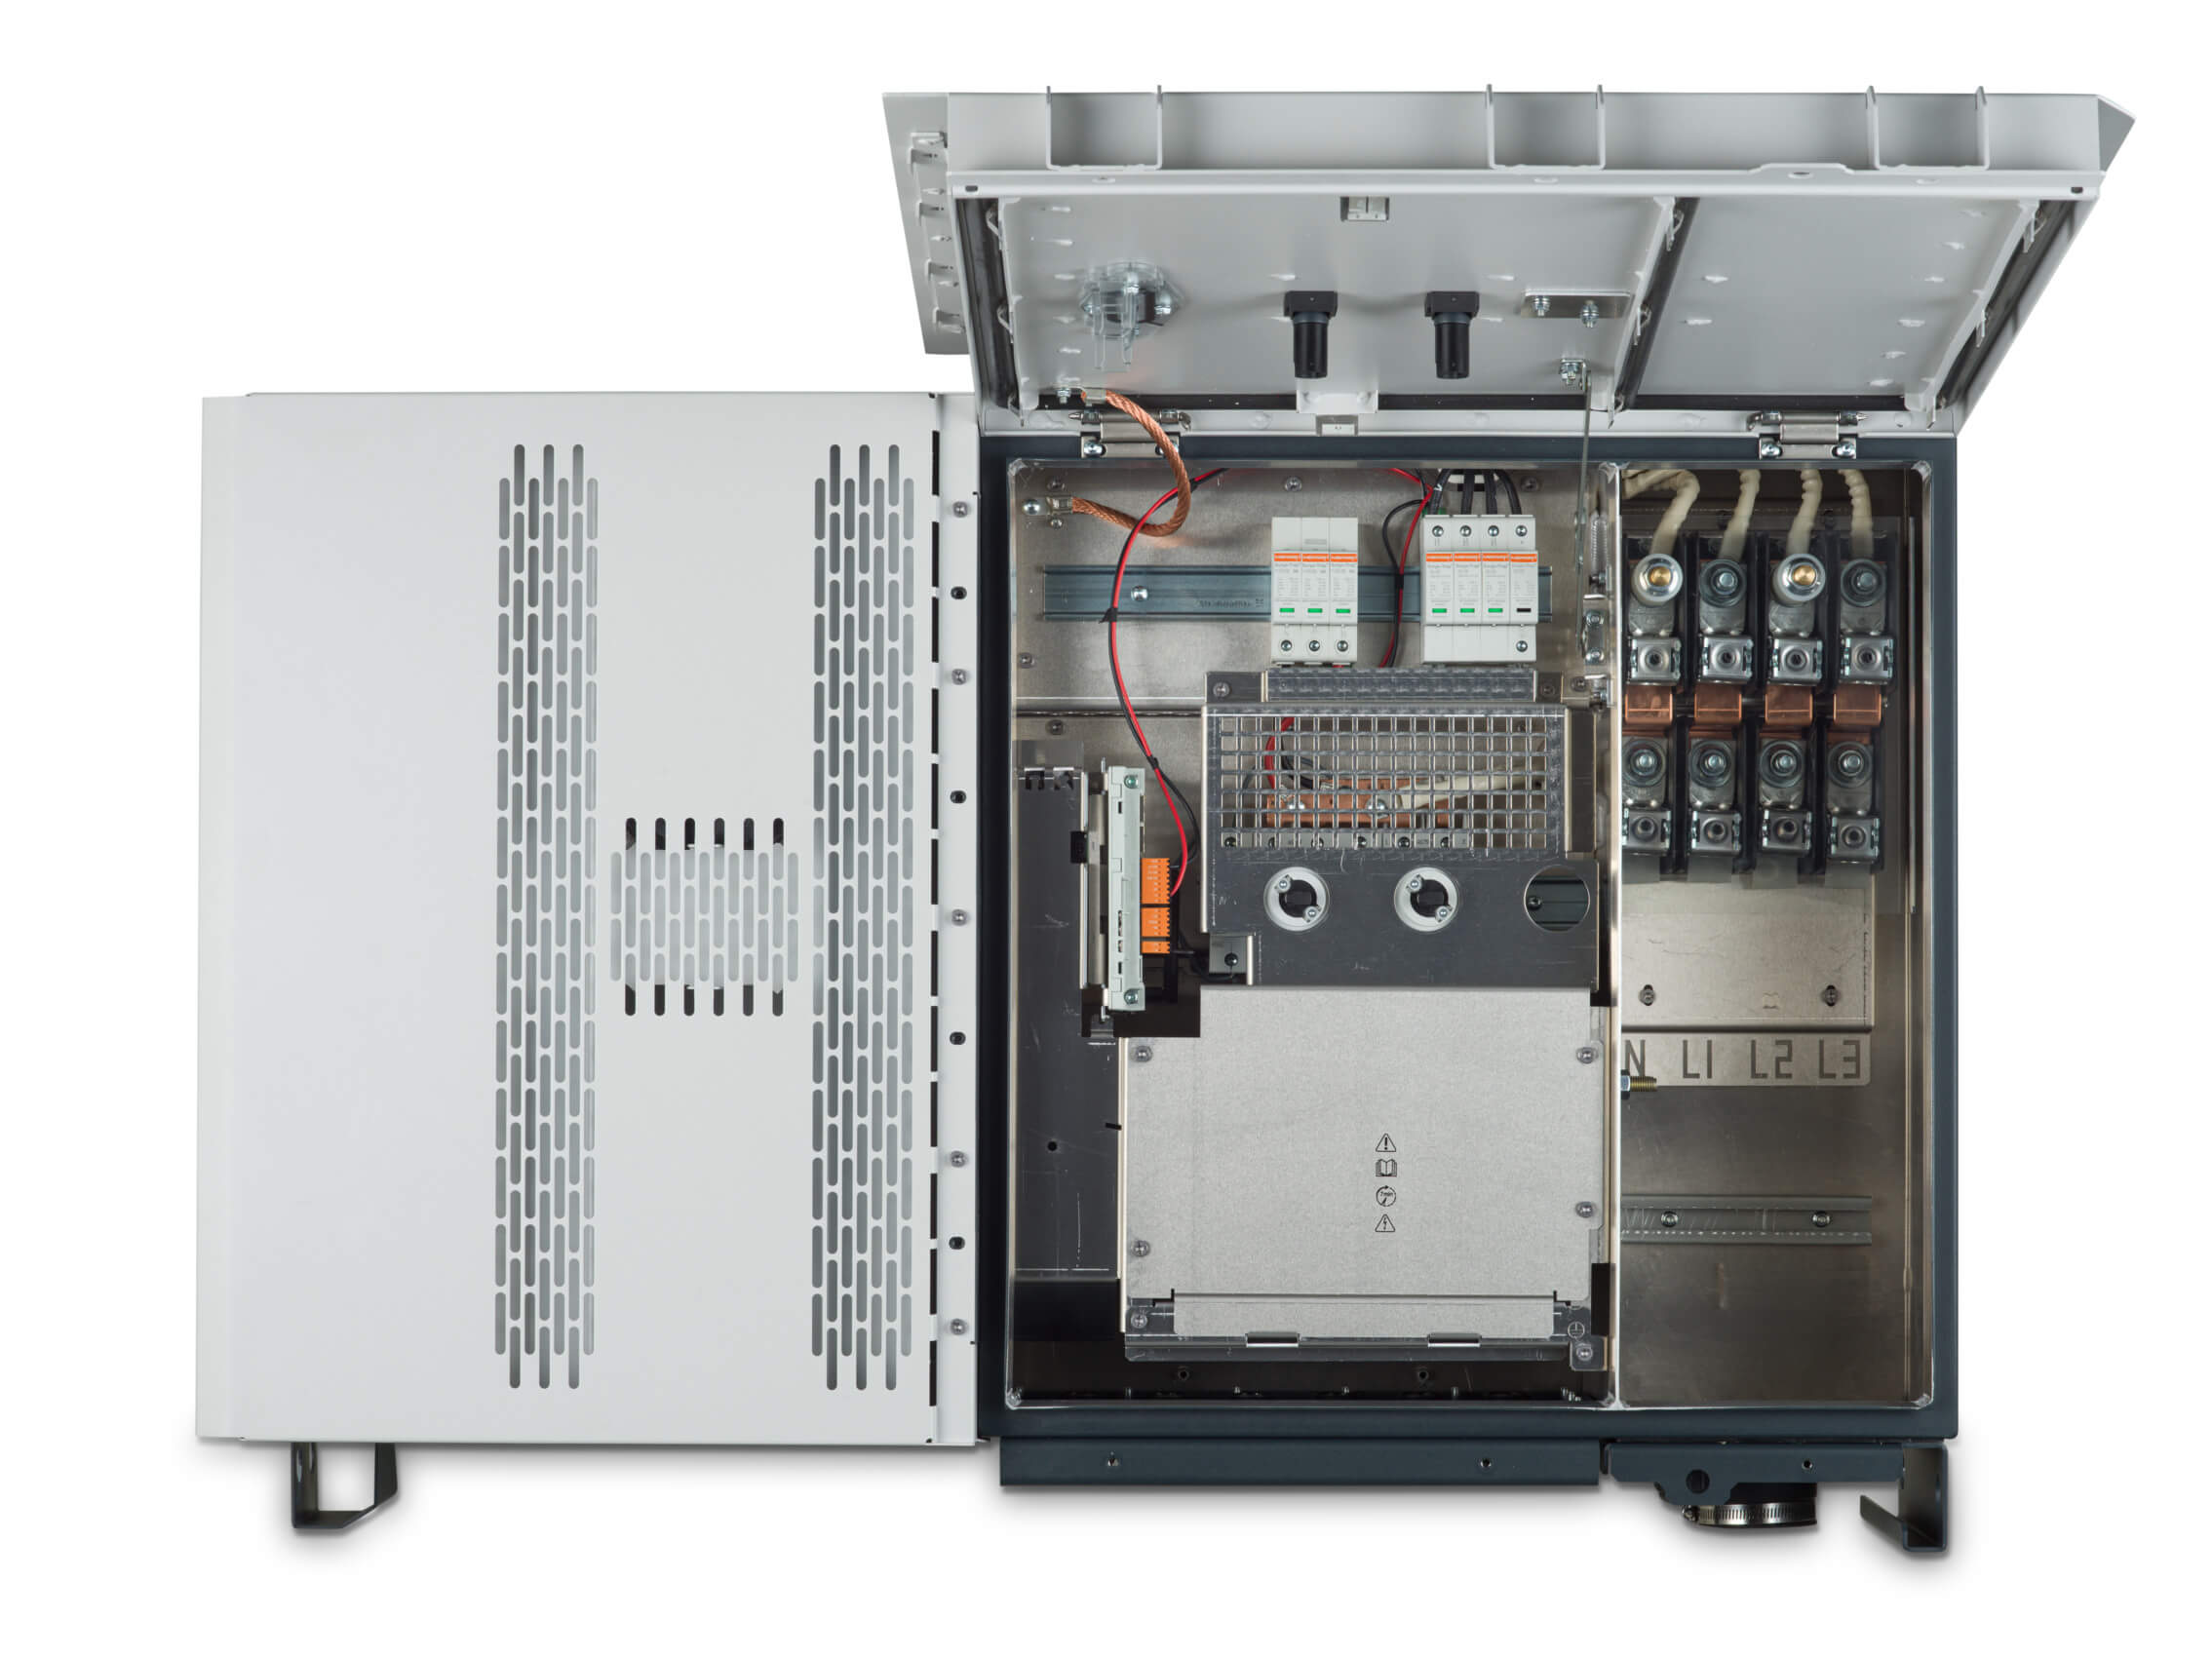 Innenleben Fronius Tauro 50 kW